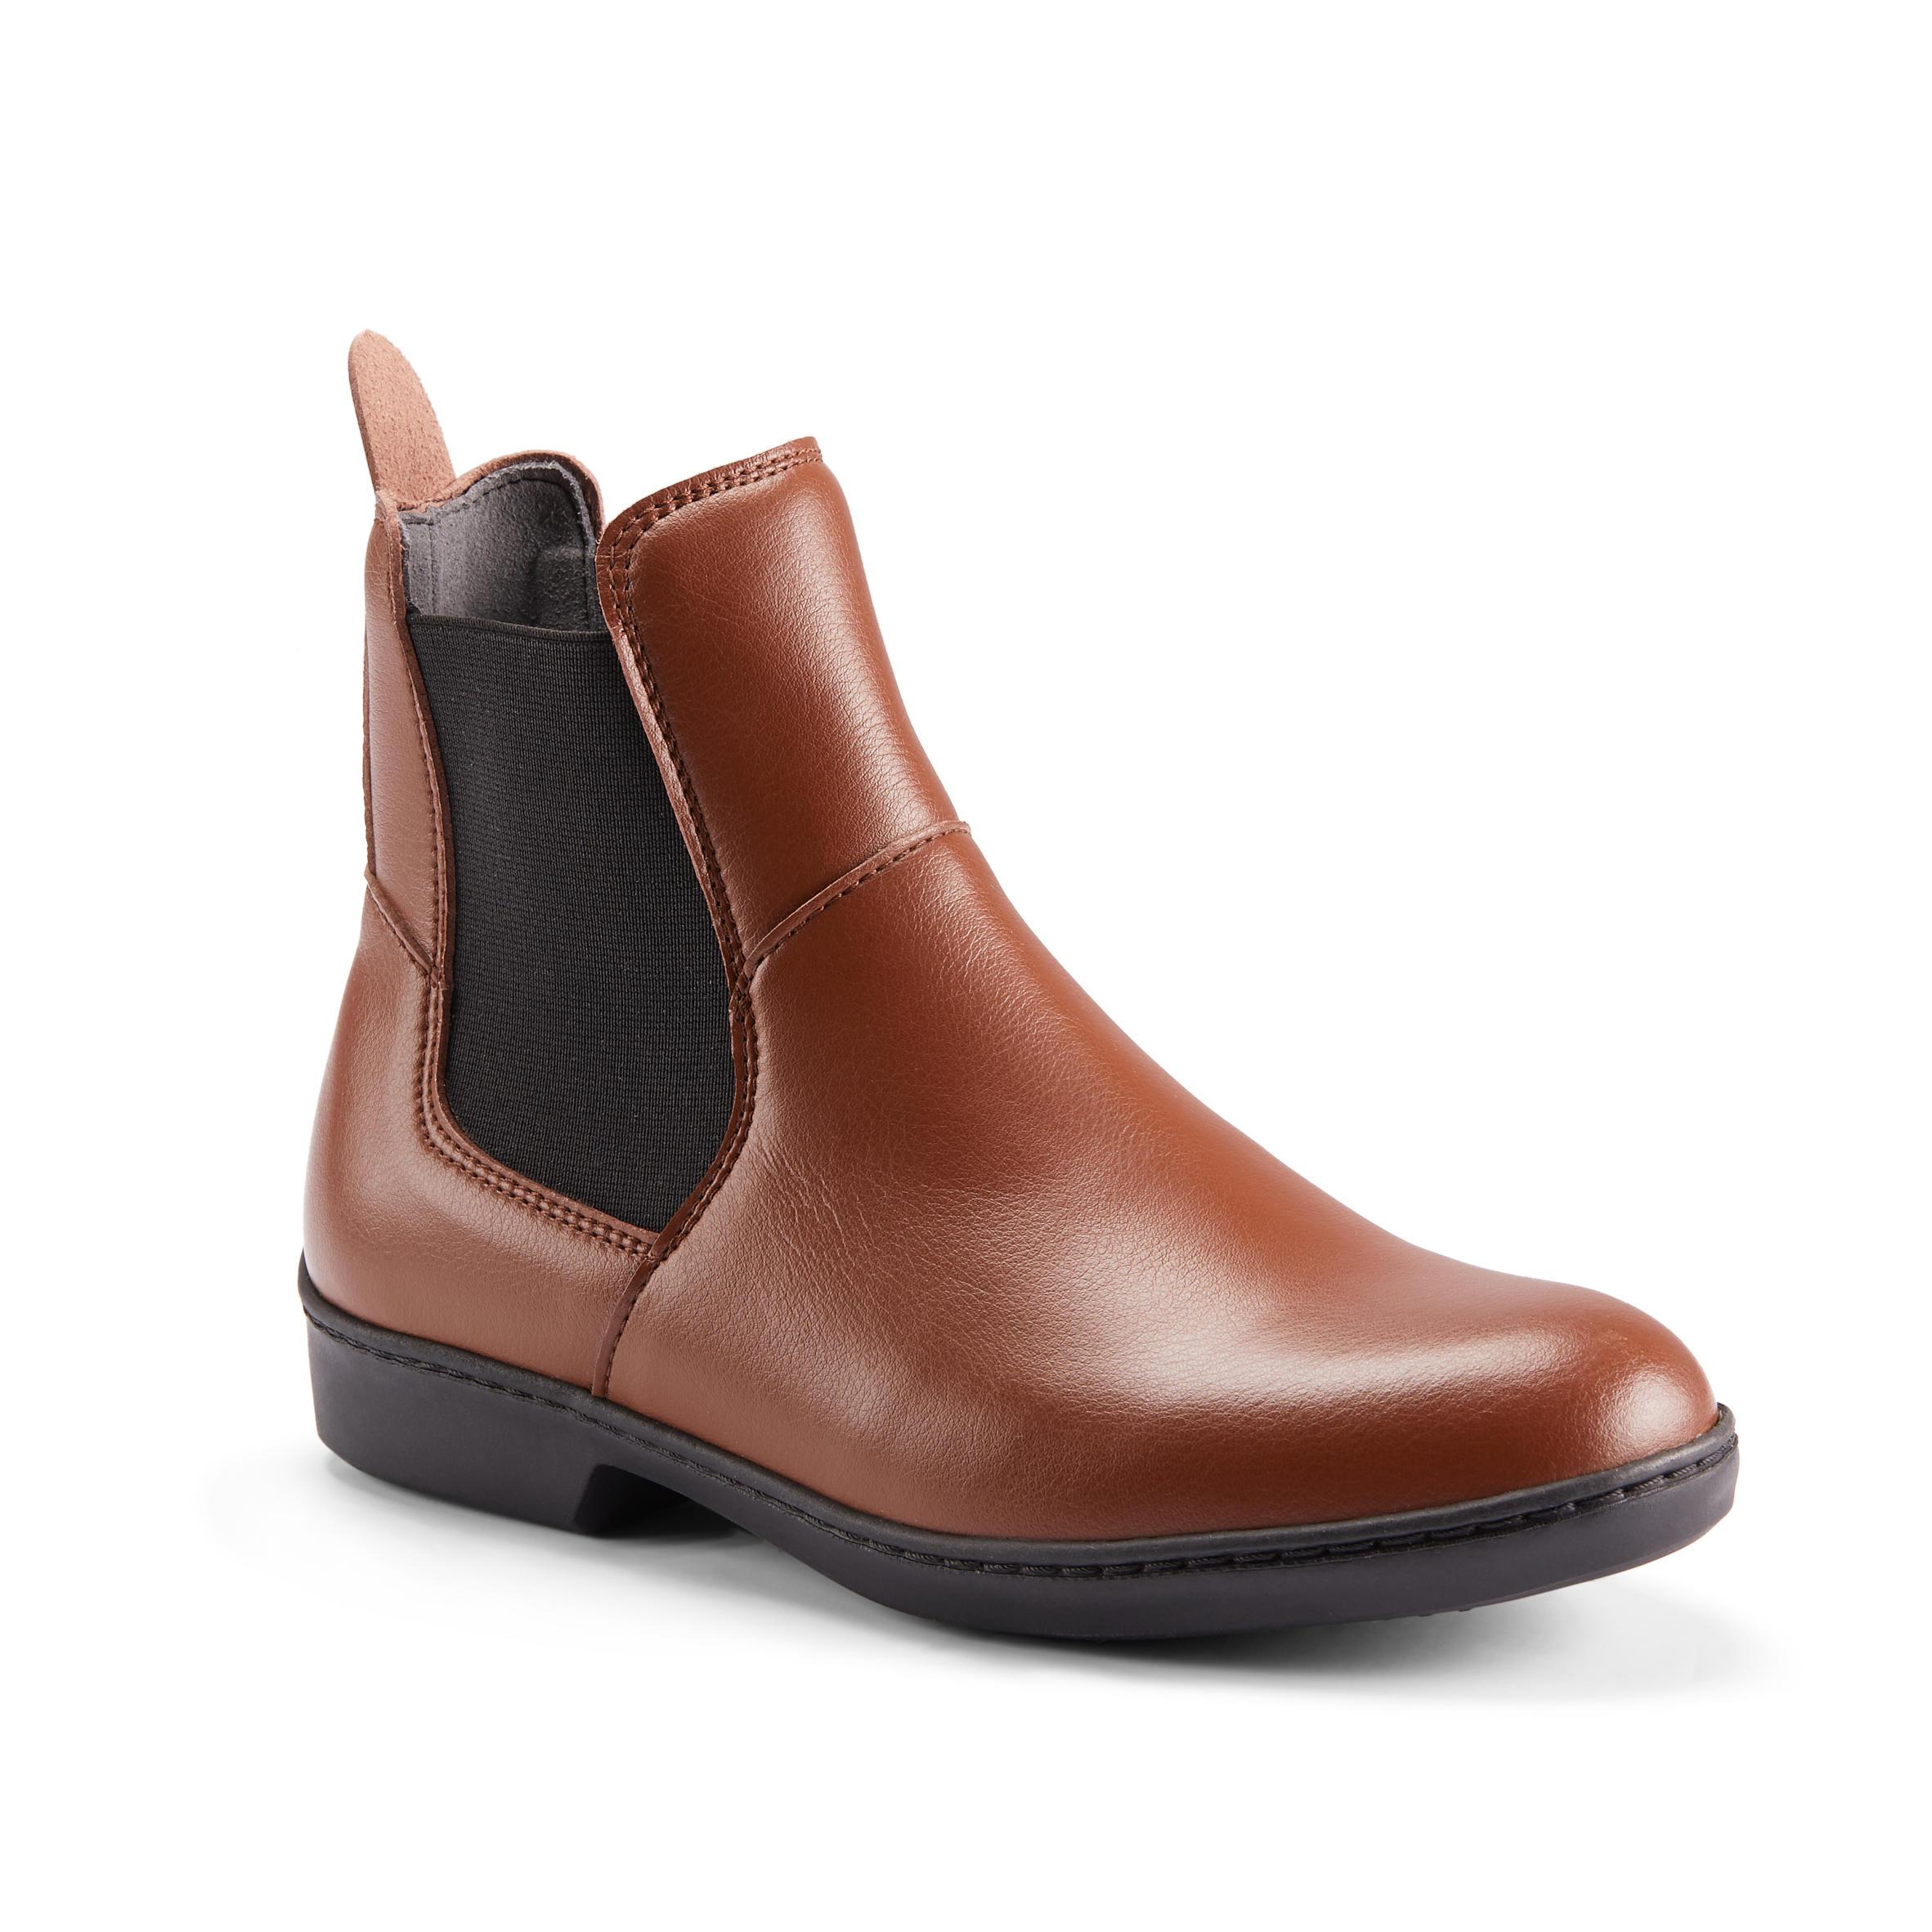 Reitstiefeletten 500 Synthetik Erwachsene   Schuhe > Sportschuhe   Fouganza